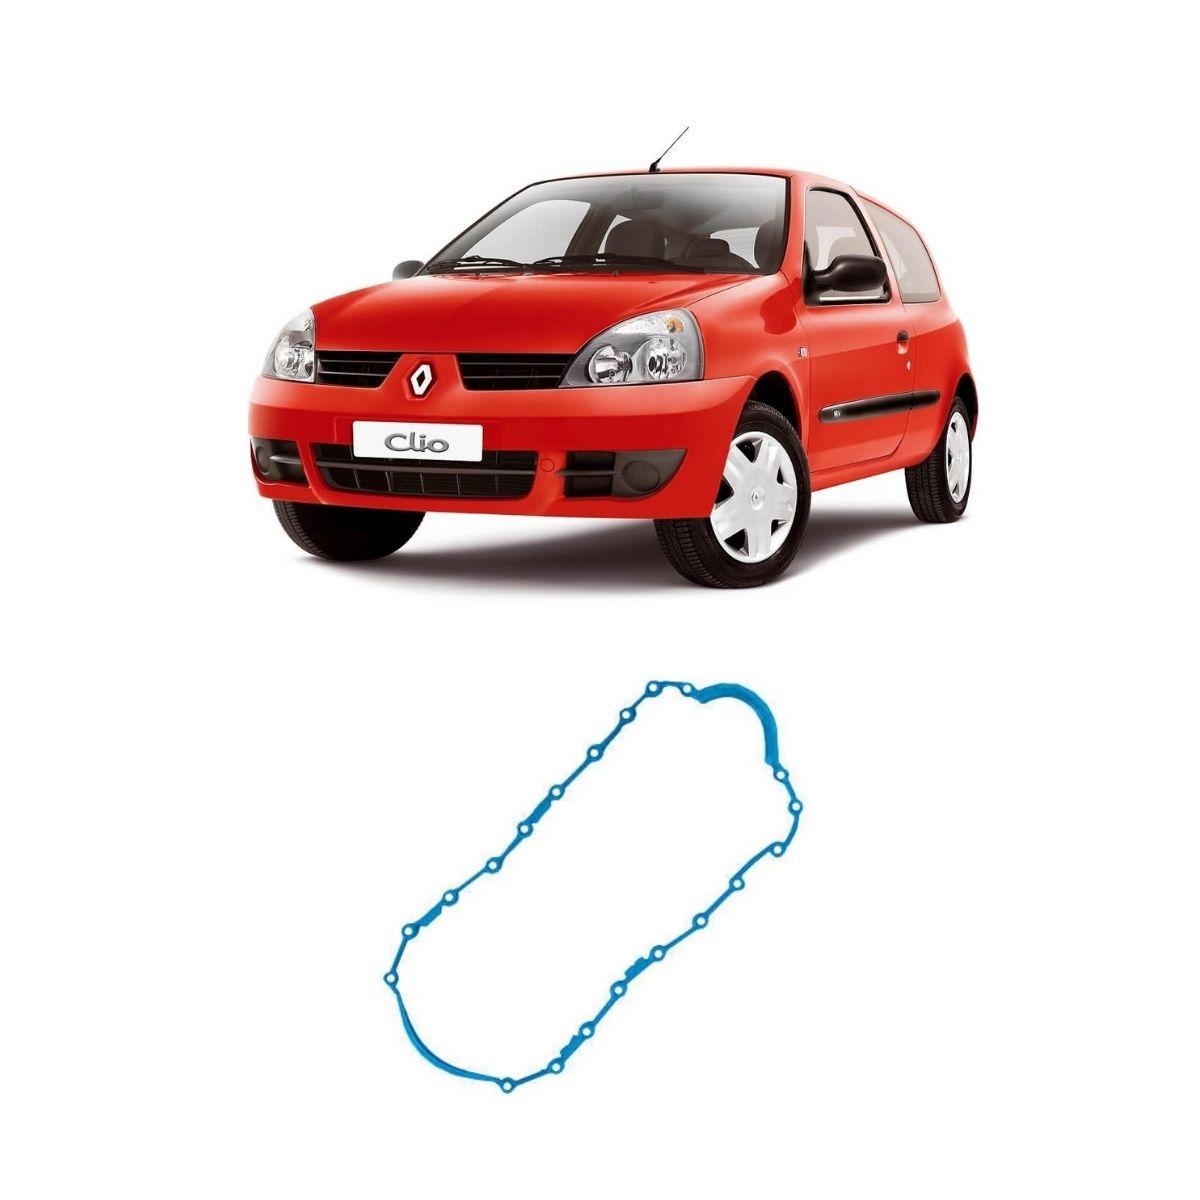 Junta Cárter Silic Renault Clio 2000/2008